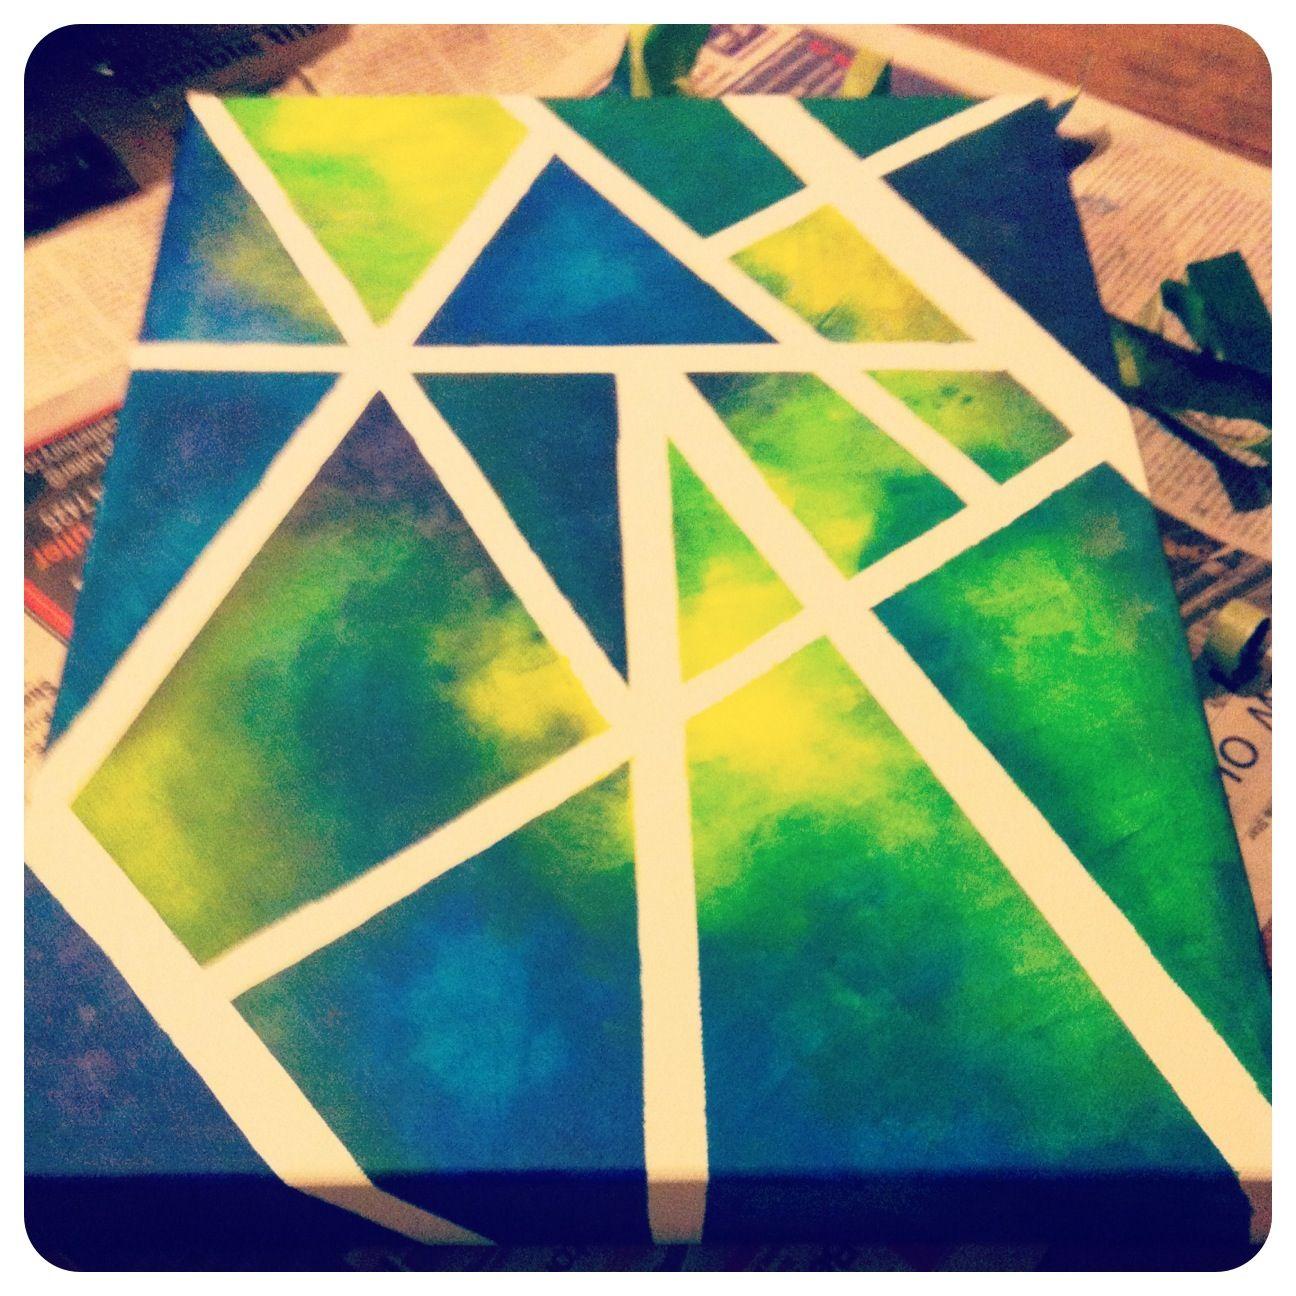 Easy canvas art using sponges and masking tape diy art